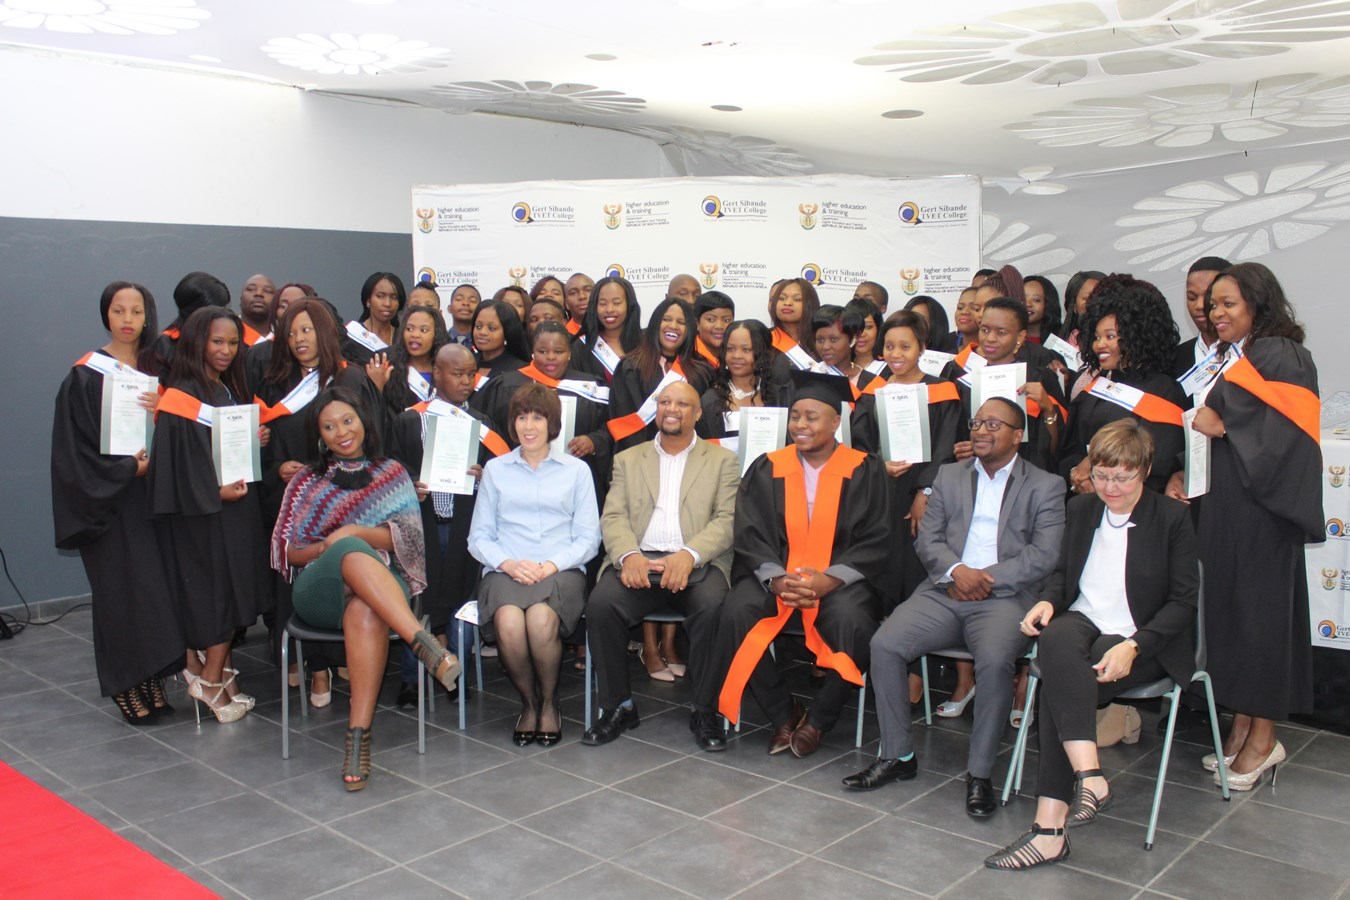 Gert Sibande College graduates